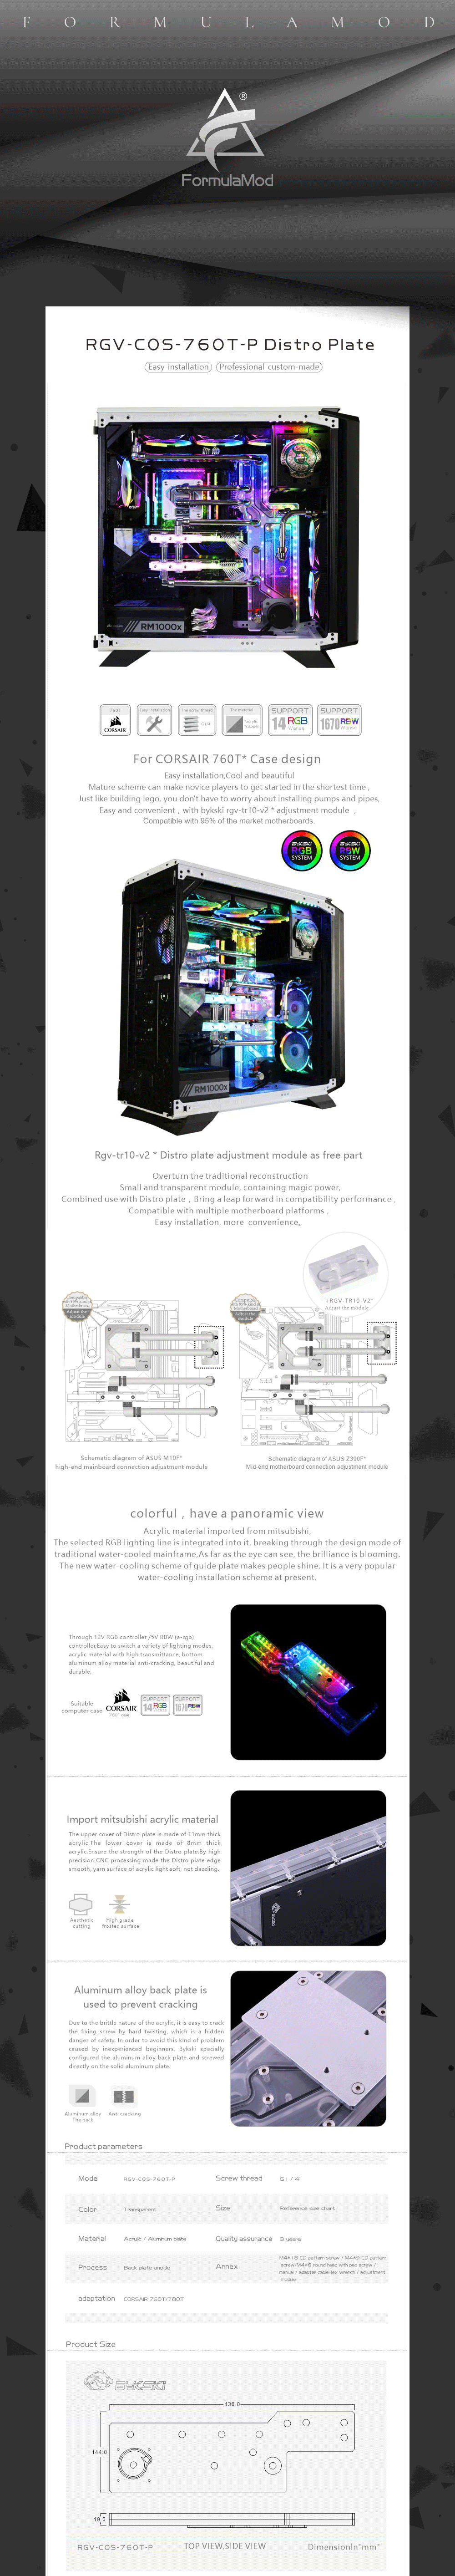 Bykski Waterway Cooling Kit For CORSAIR 760T/780T Case, 5V ARGB, For Single GPU Building, RGV-COS-760T-P